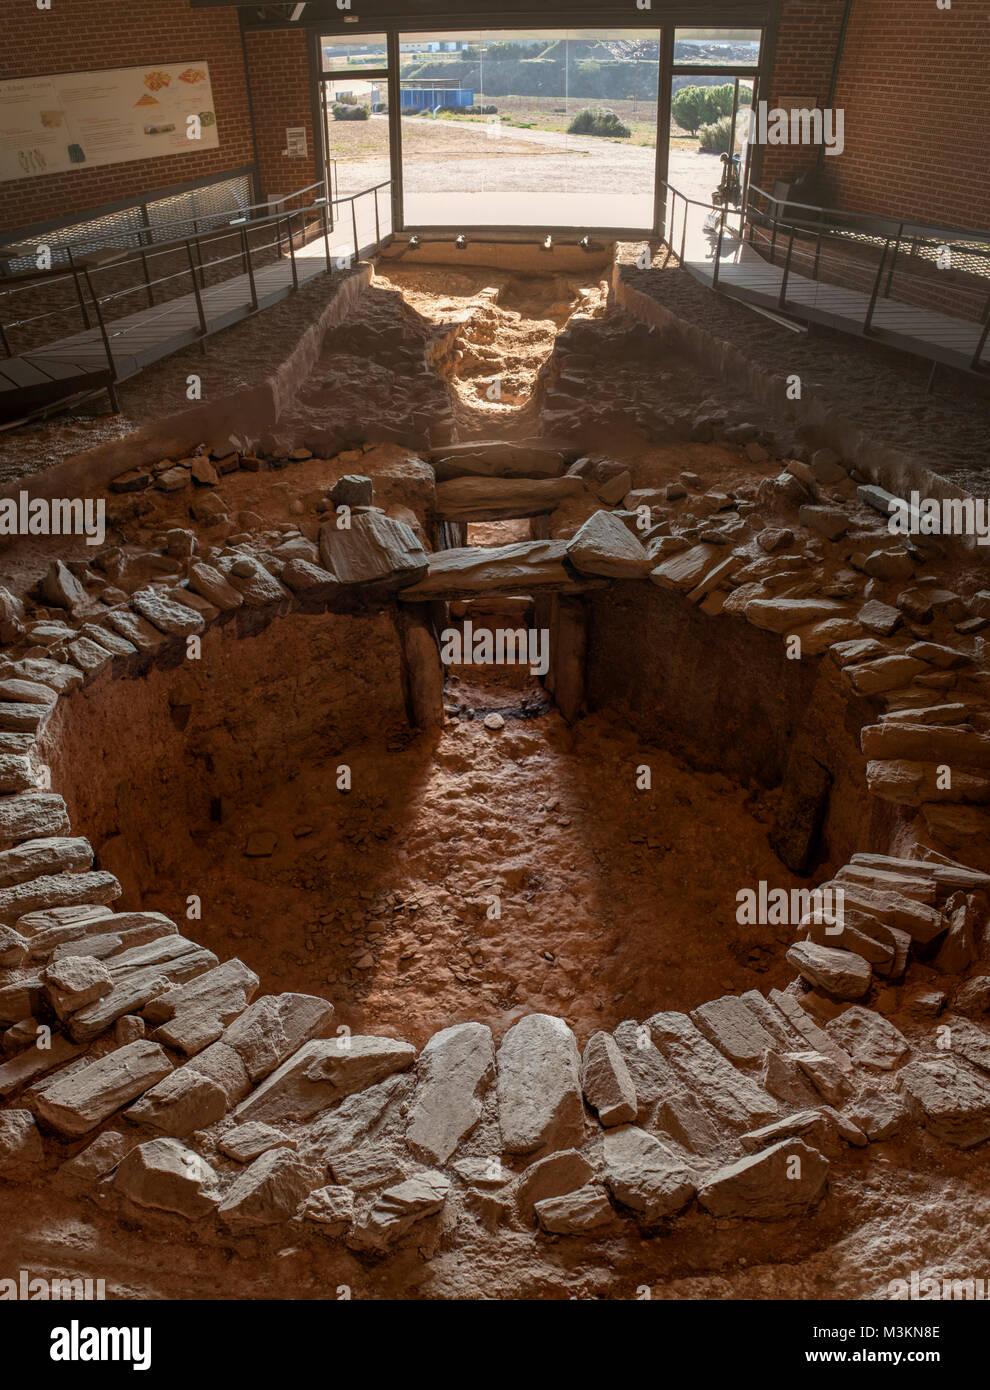 Archeological site of Huerta Montero, the most singular Calcholitic Tholos Dolmen in Europe, Almendralejo, Spain. - Stock Image